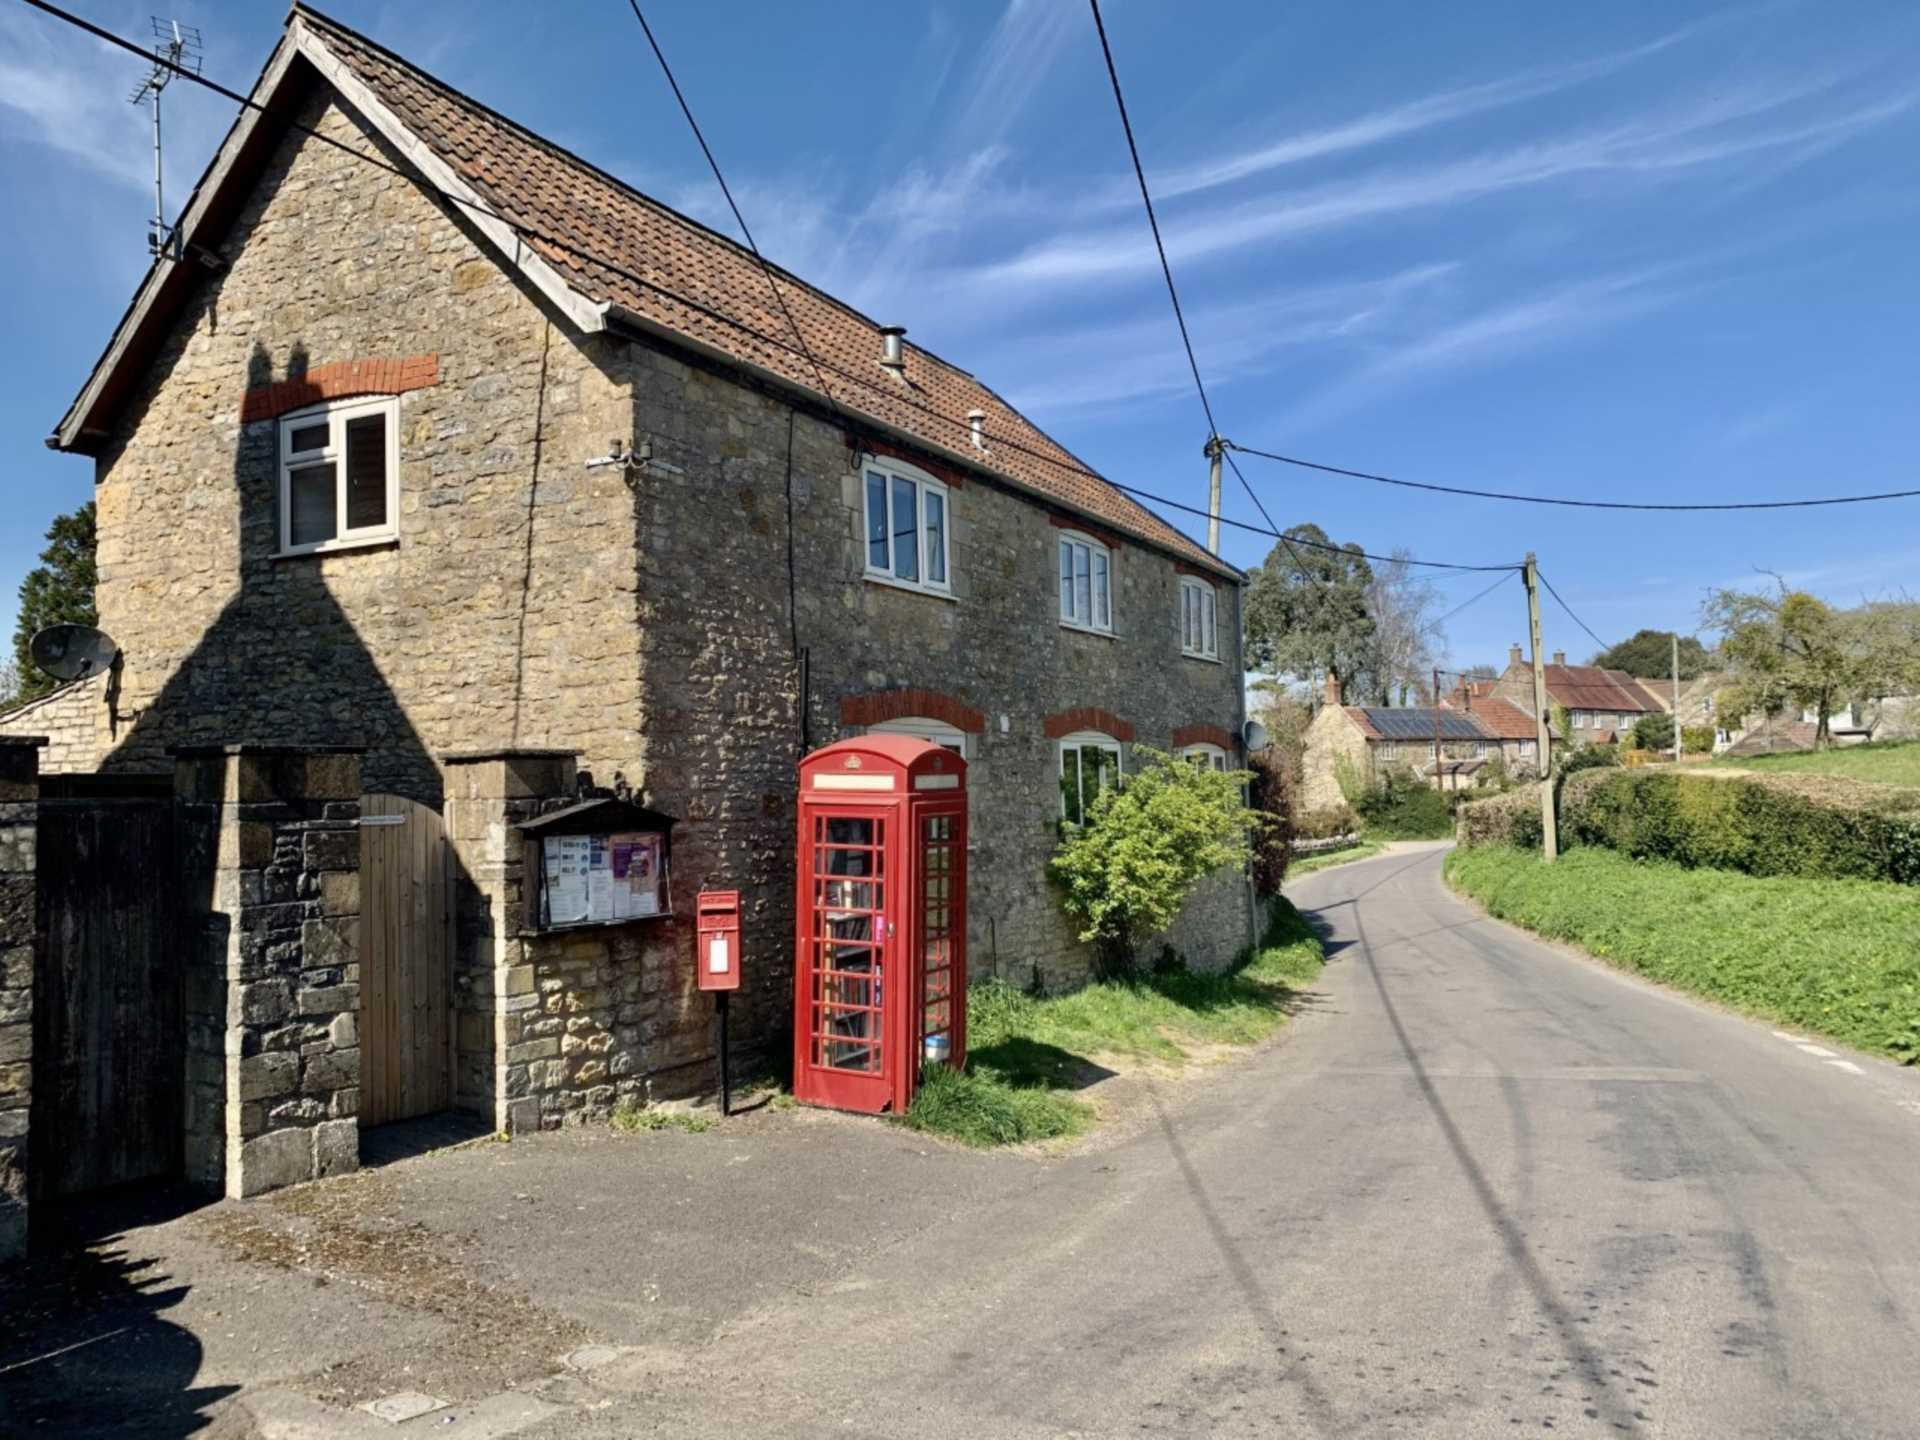 Swallows Property Letting - 4 Bedroom Cottage, Lamyatt, Shepton Mallet